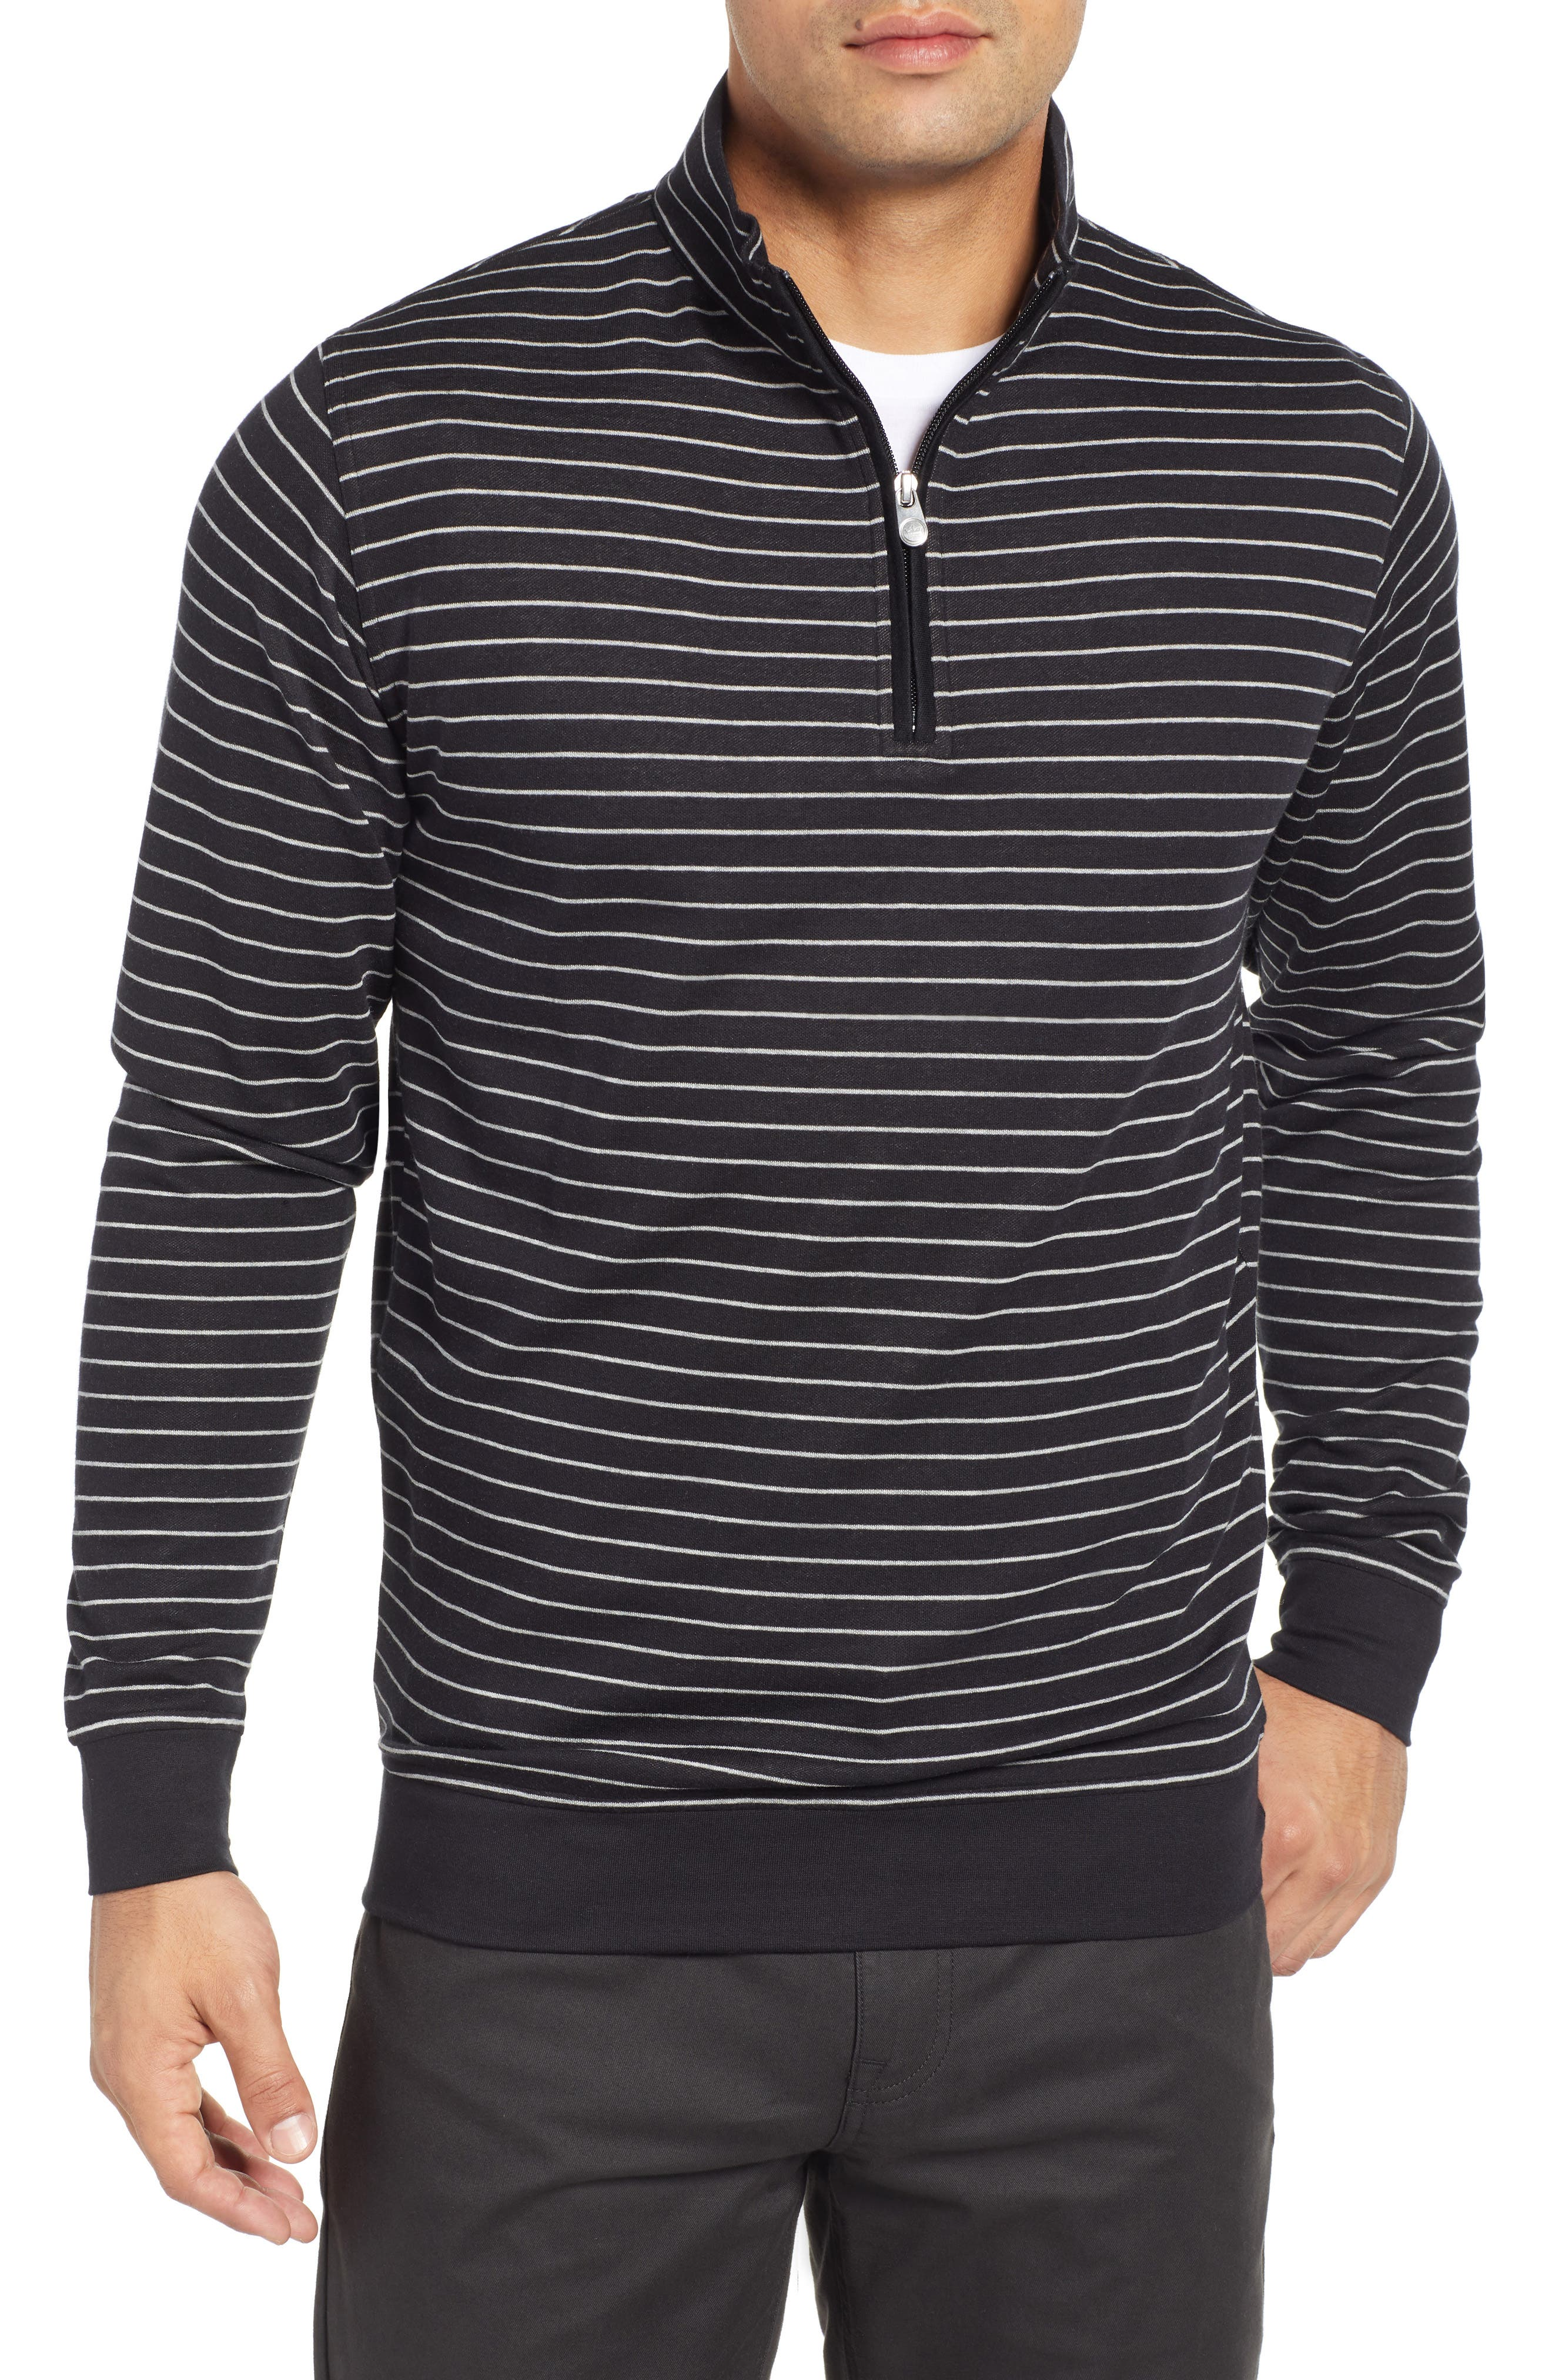 PETER MILLAR, Classic Fit Pullover, Main thumbnail 1, color, BLACK